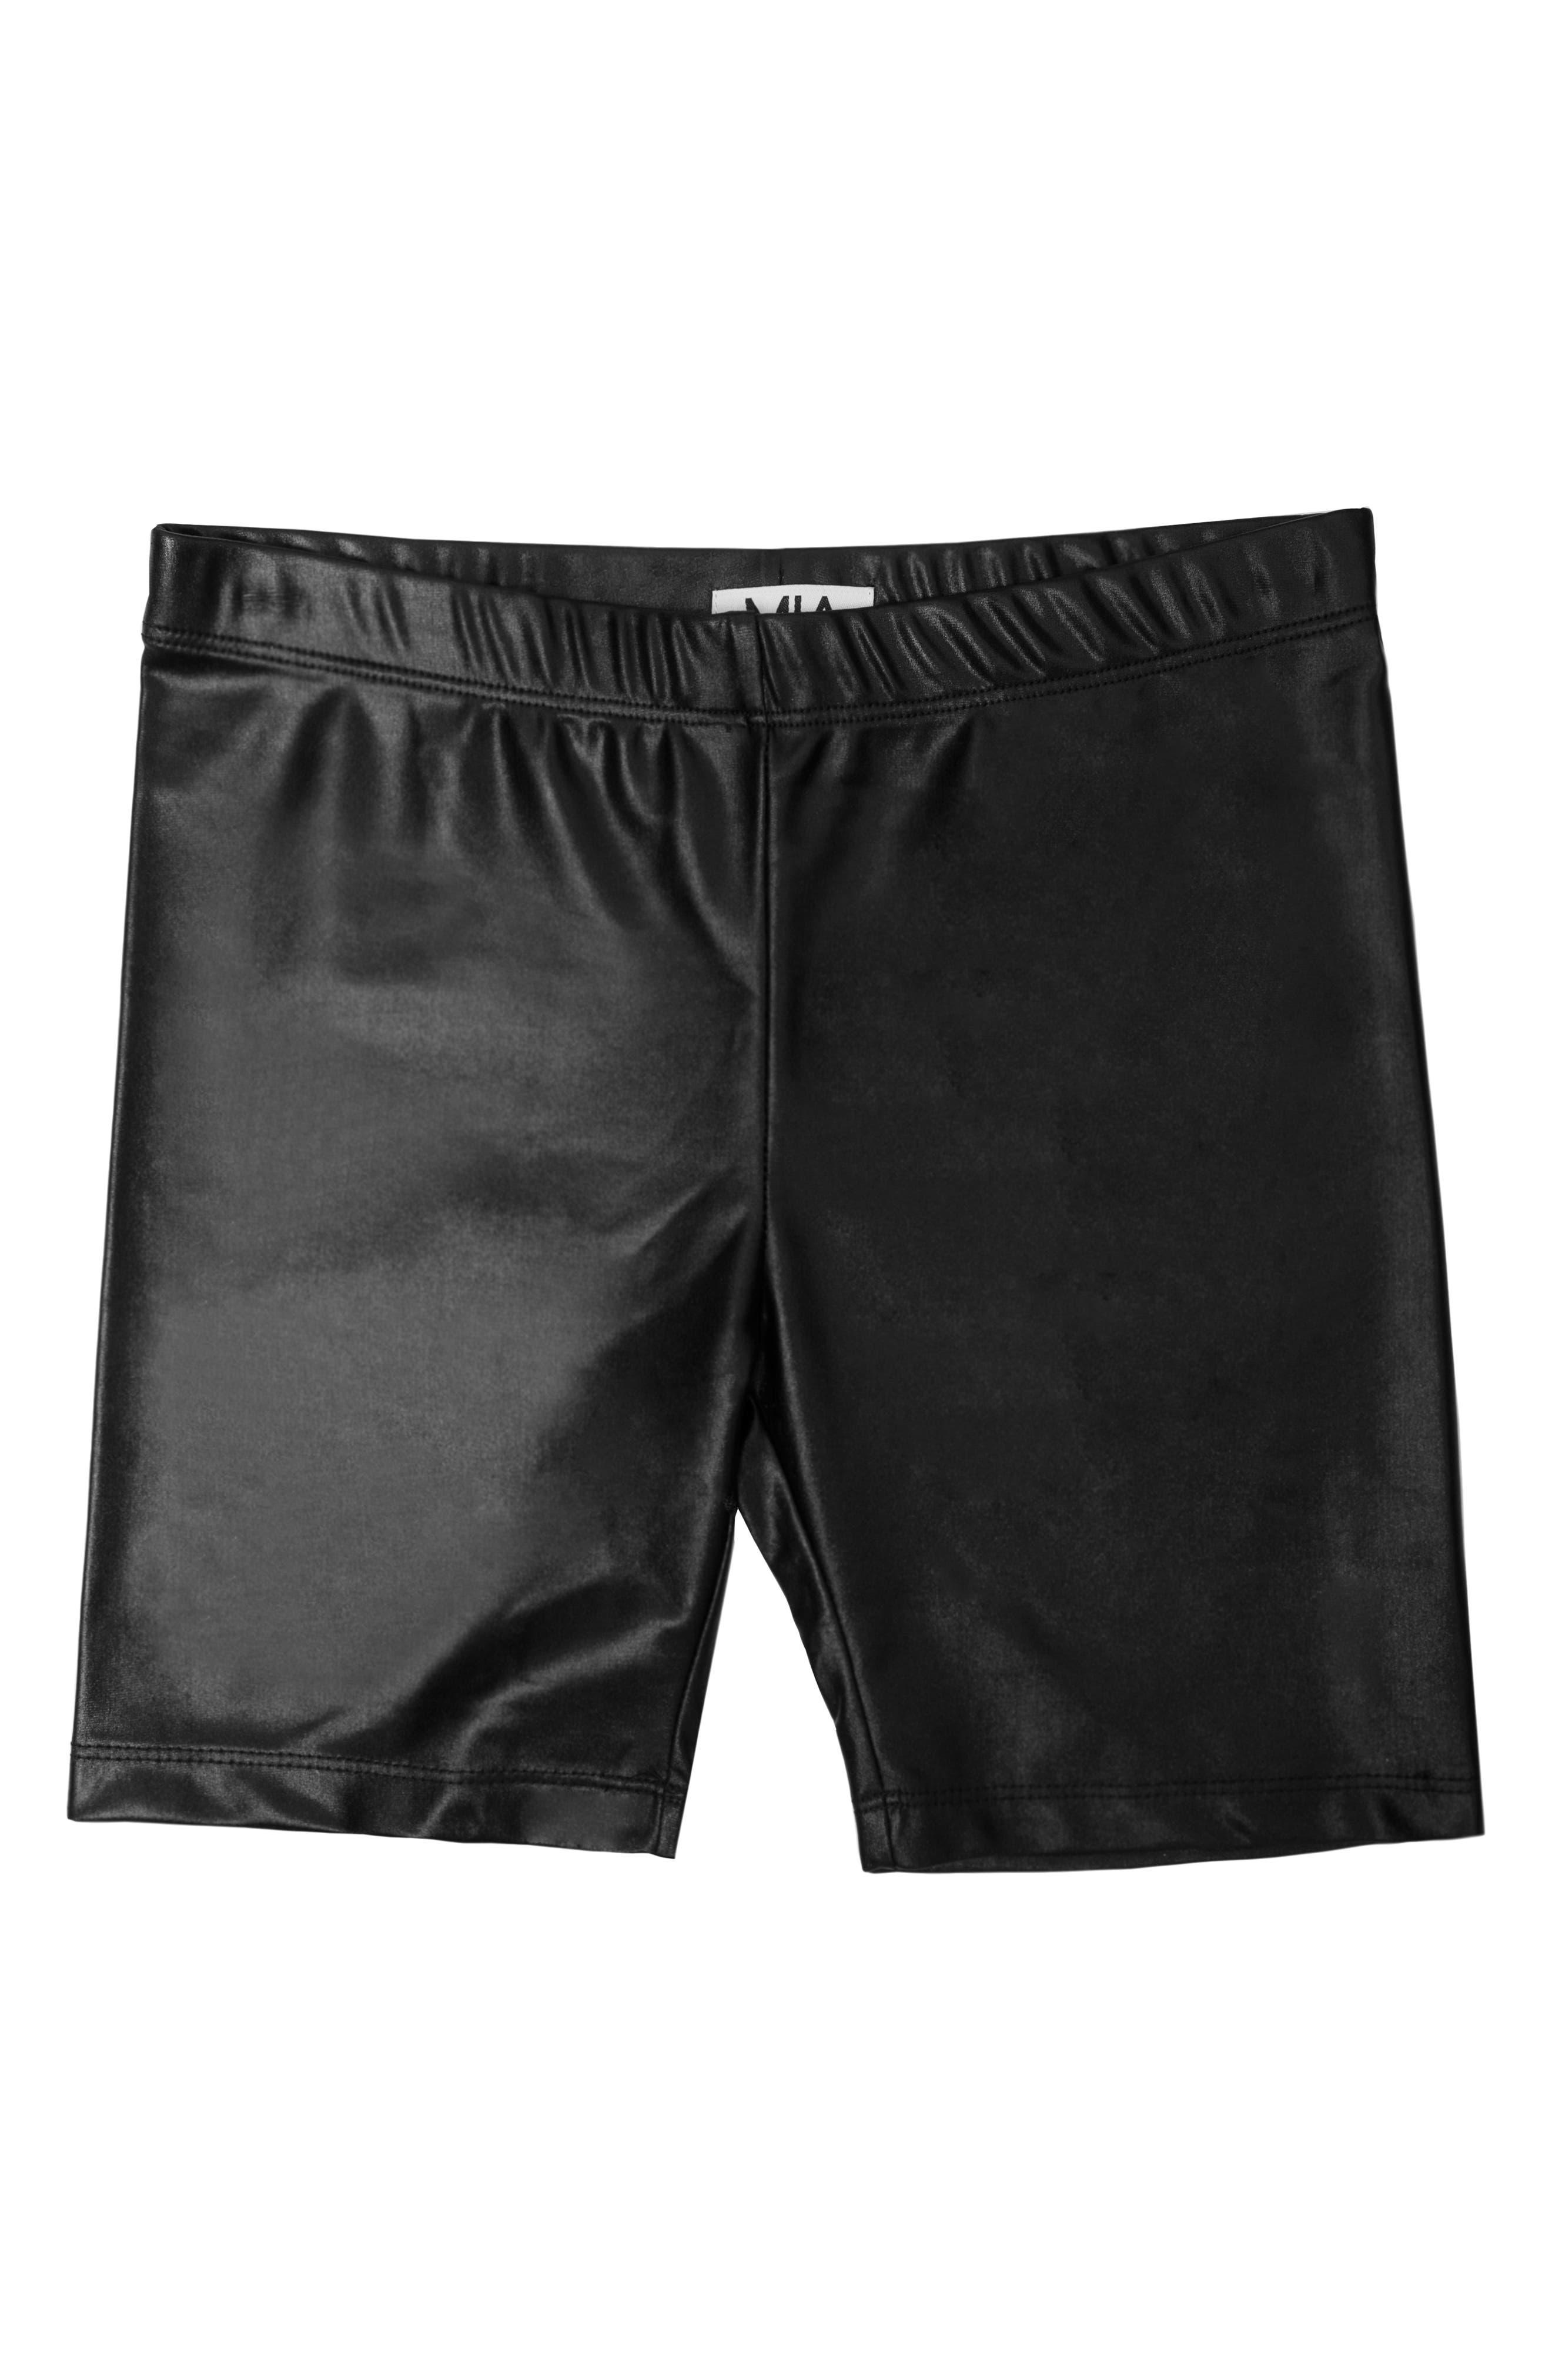 MIA New York Girl's Mia New York Bike Shorts, Size XL - Black